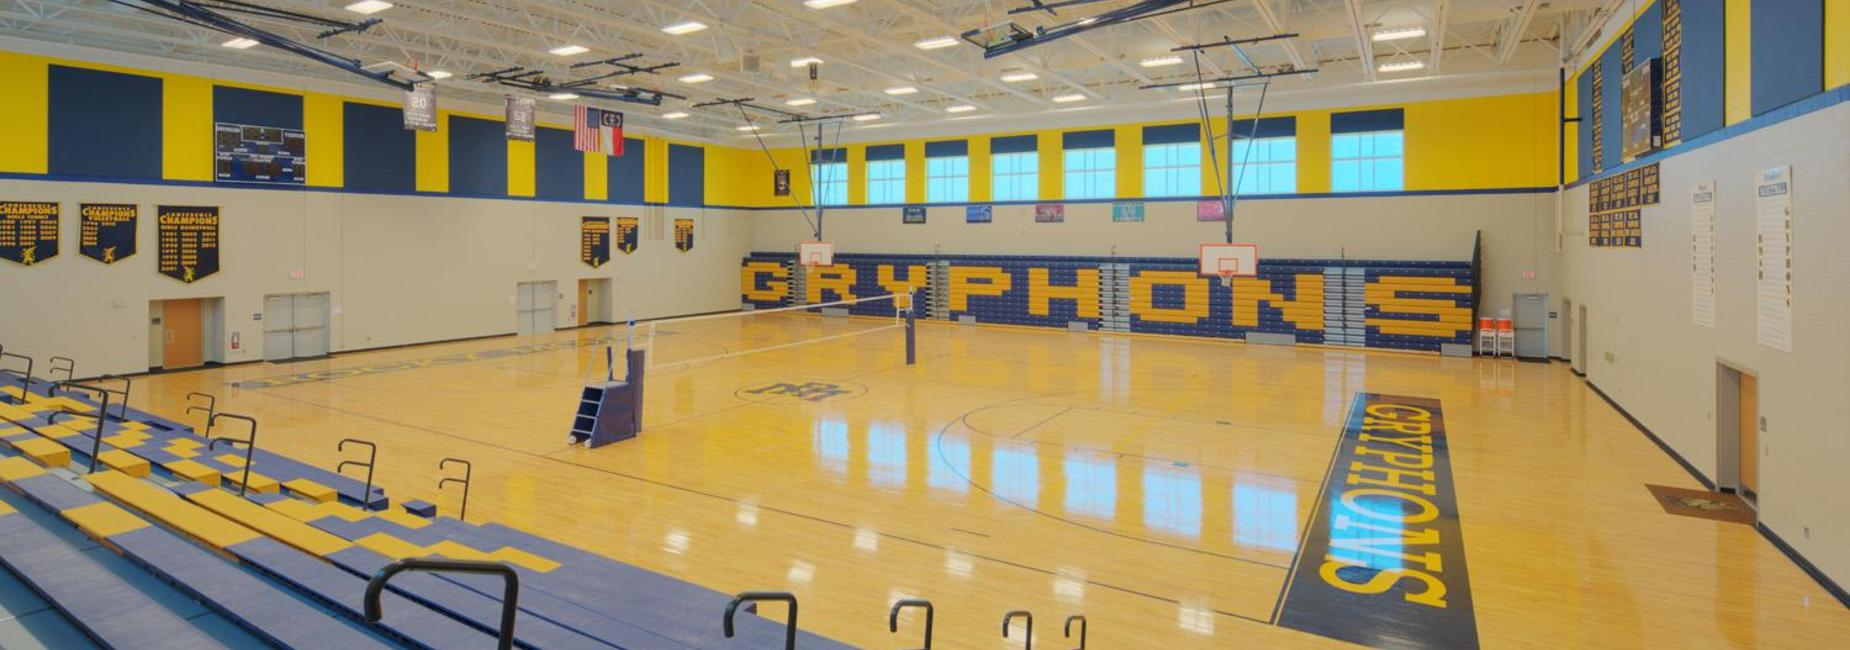 RMHS Gymnasium